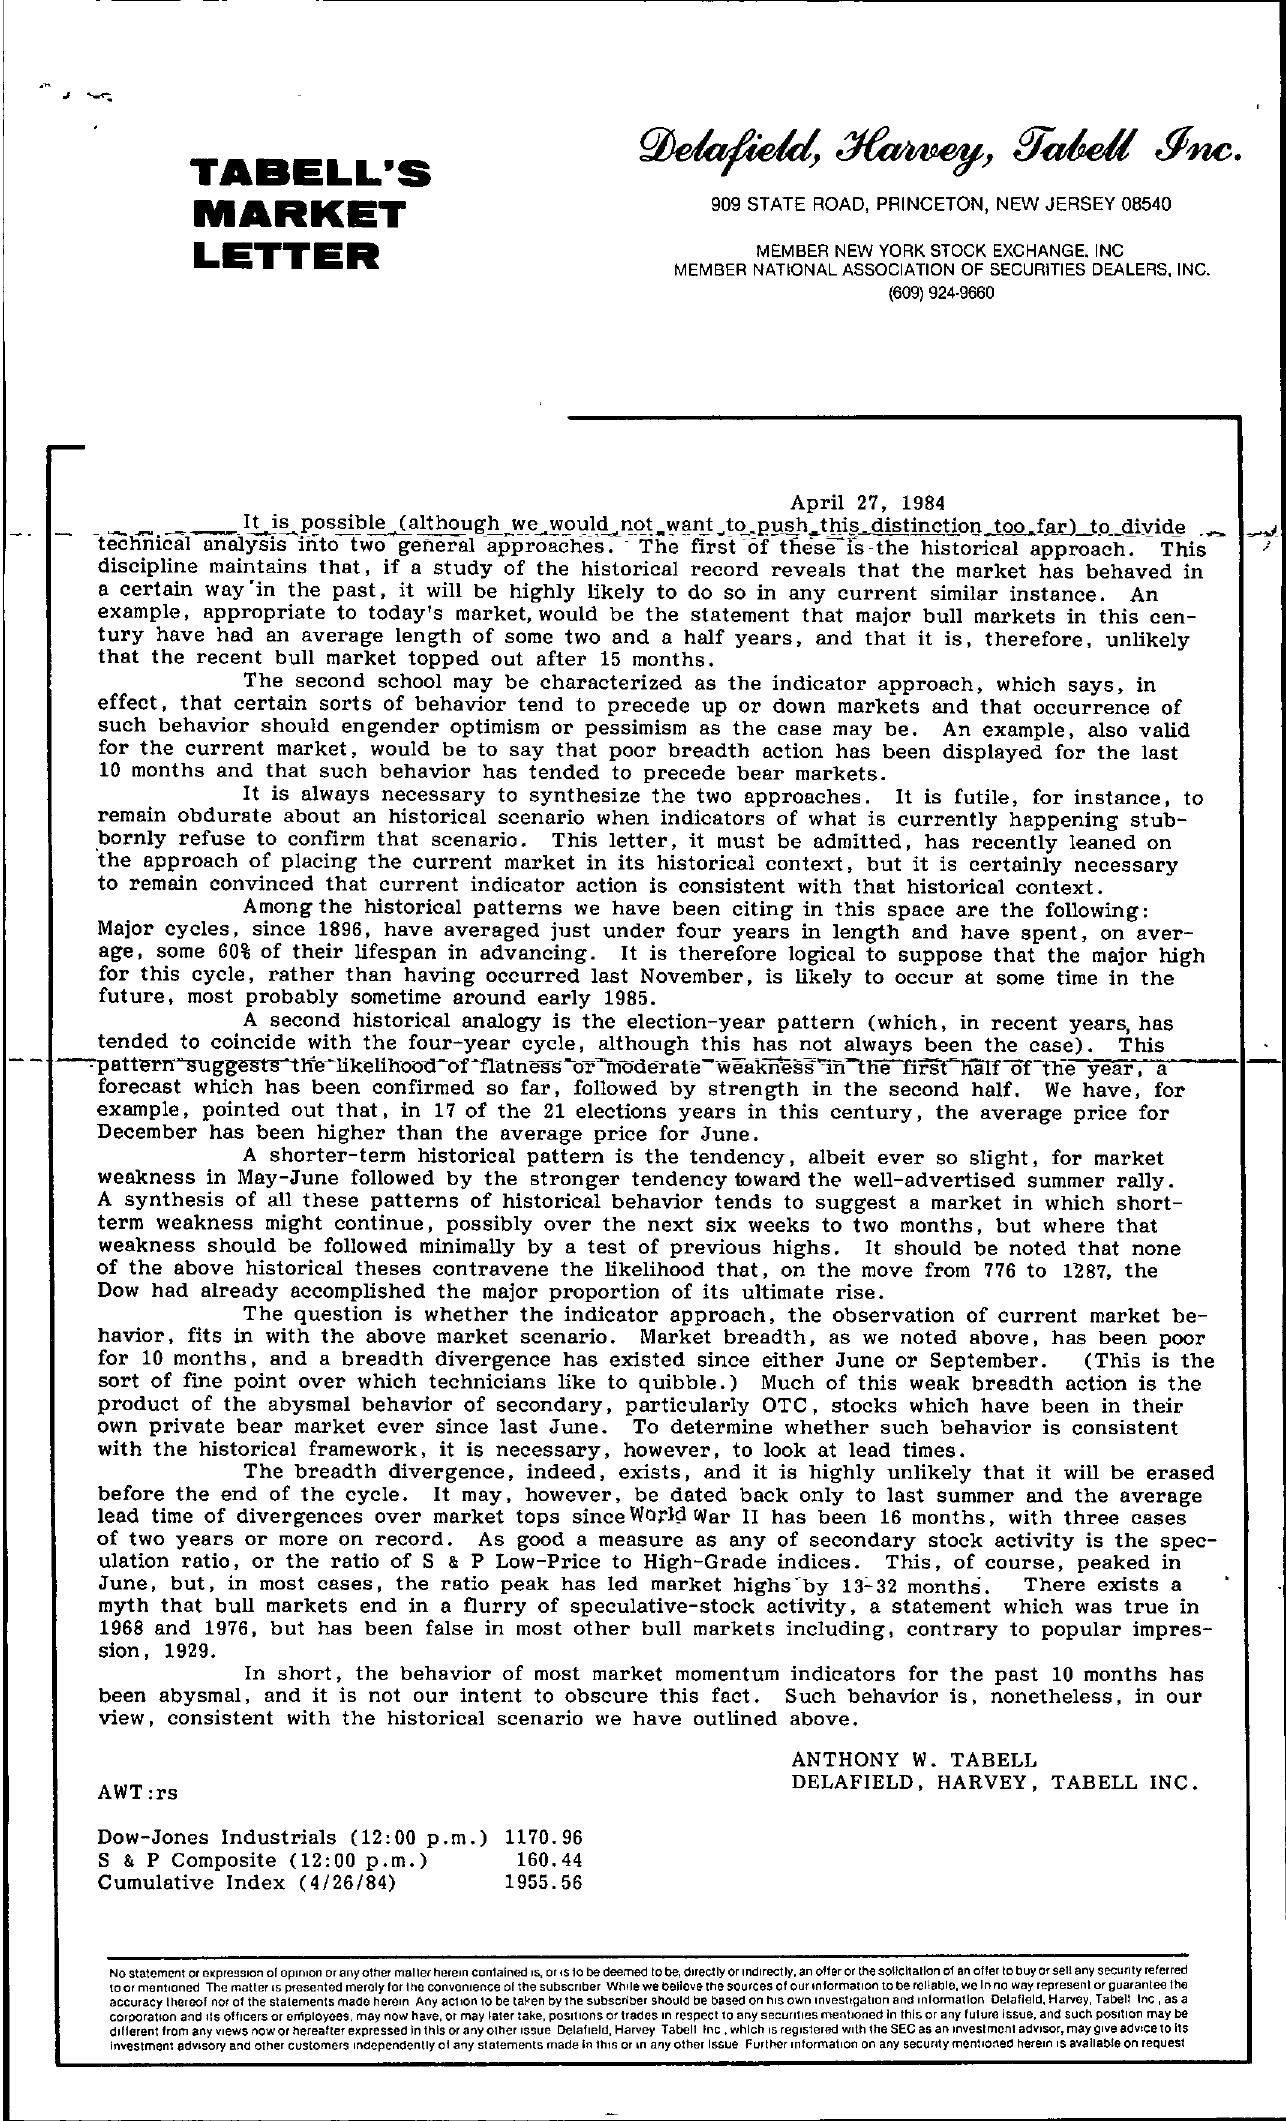 Tabell's Market Letter - April 27, 1984